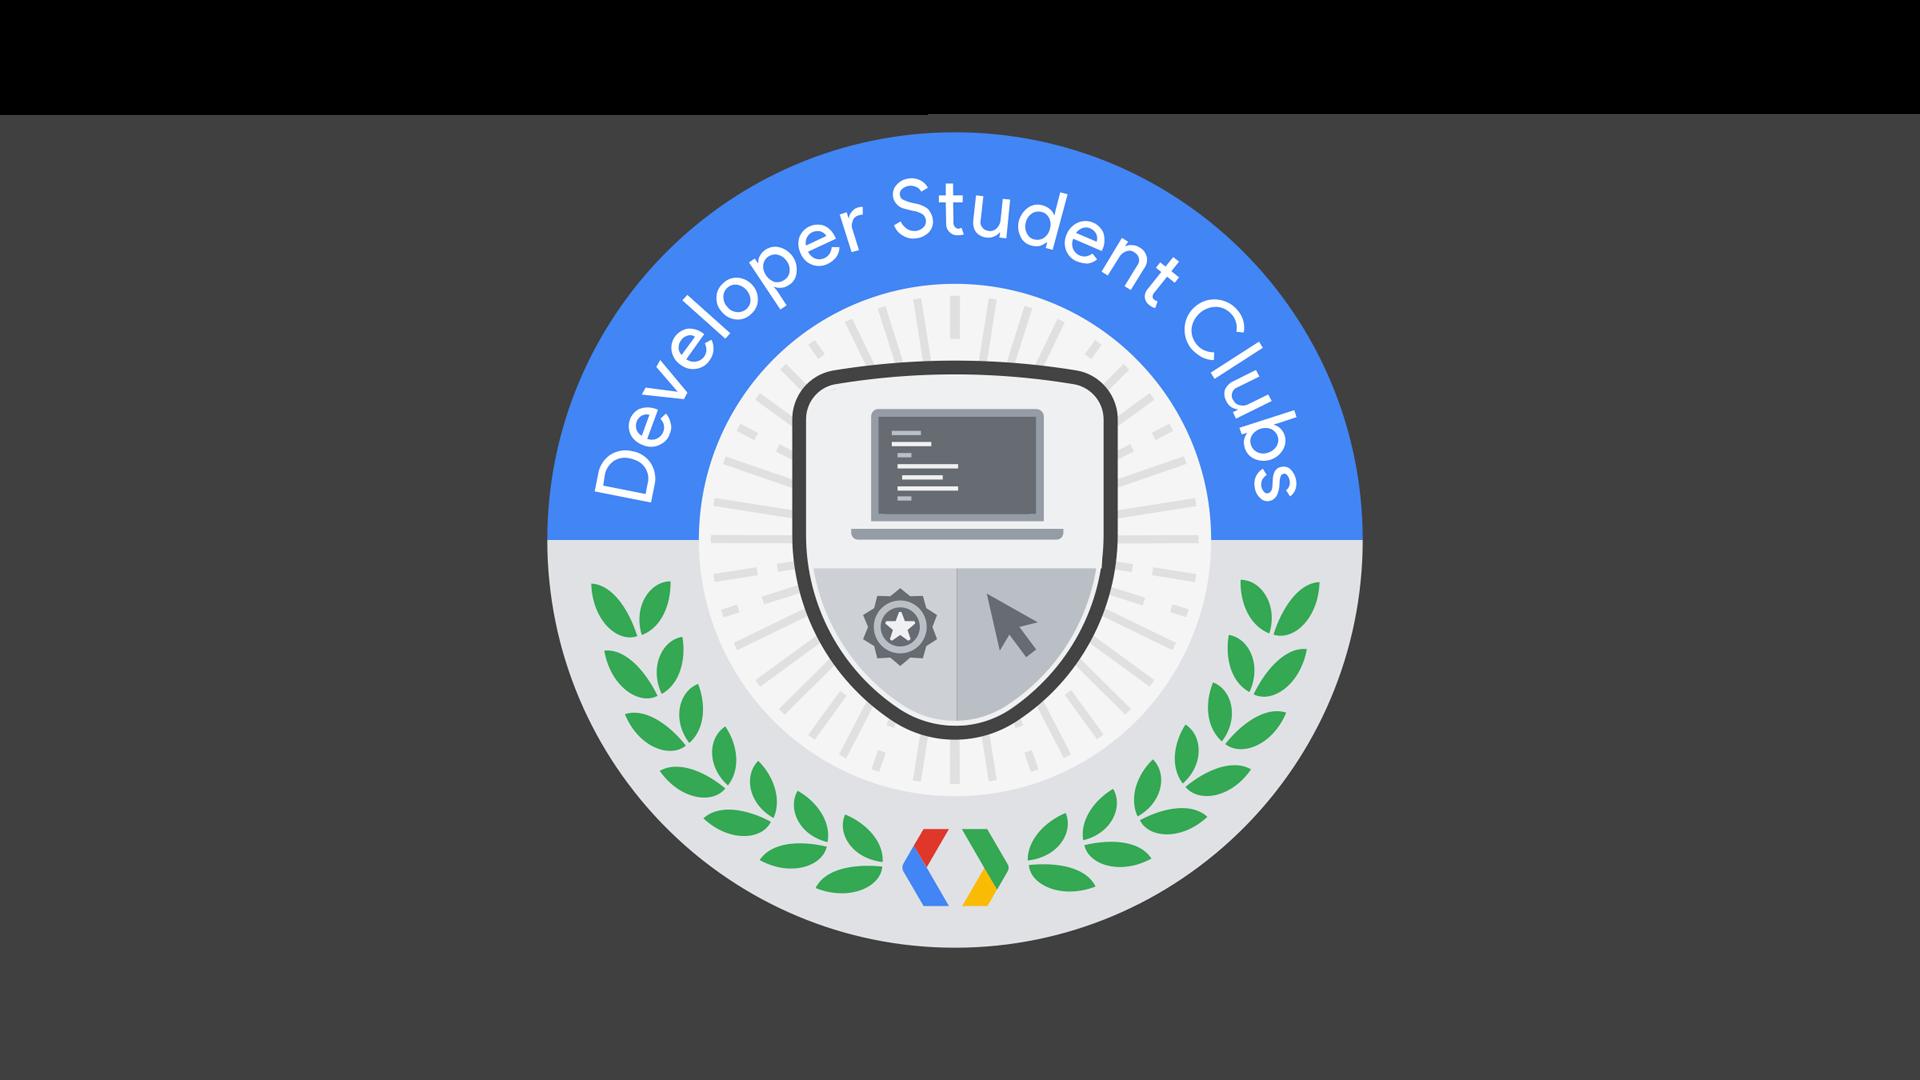 [DSC EVENT] Google Cloud Study Jam 2019 - Having Fun with Google Cloud